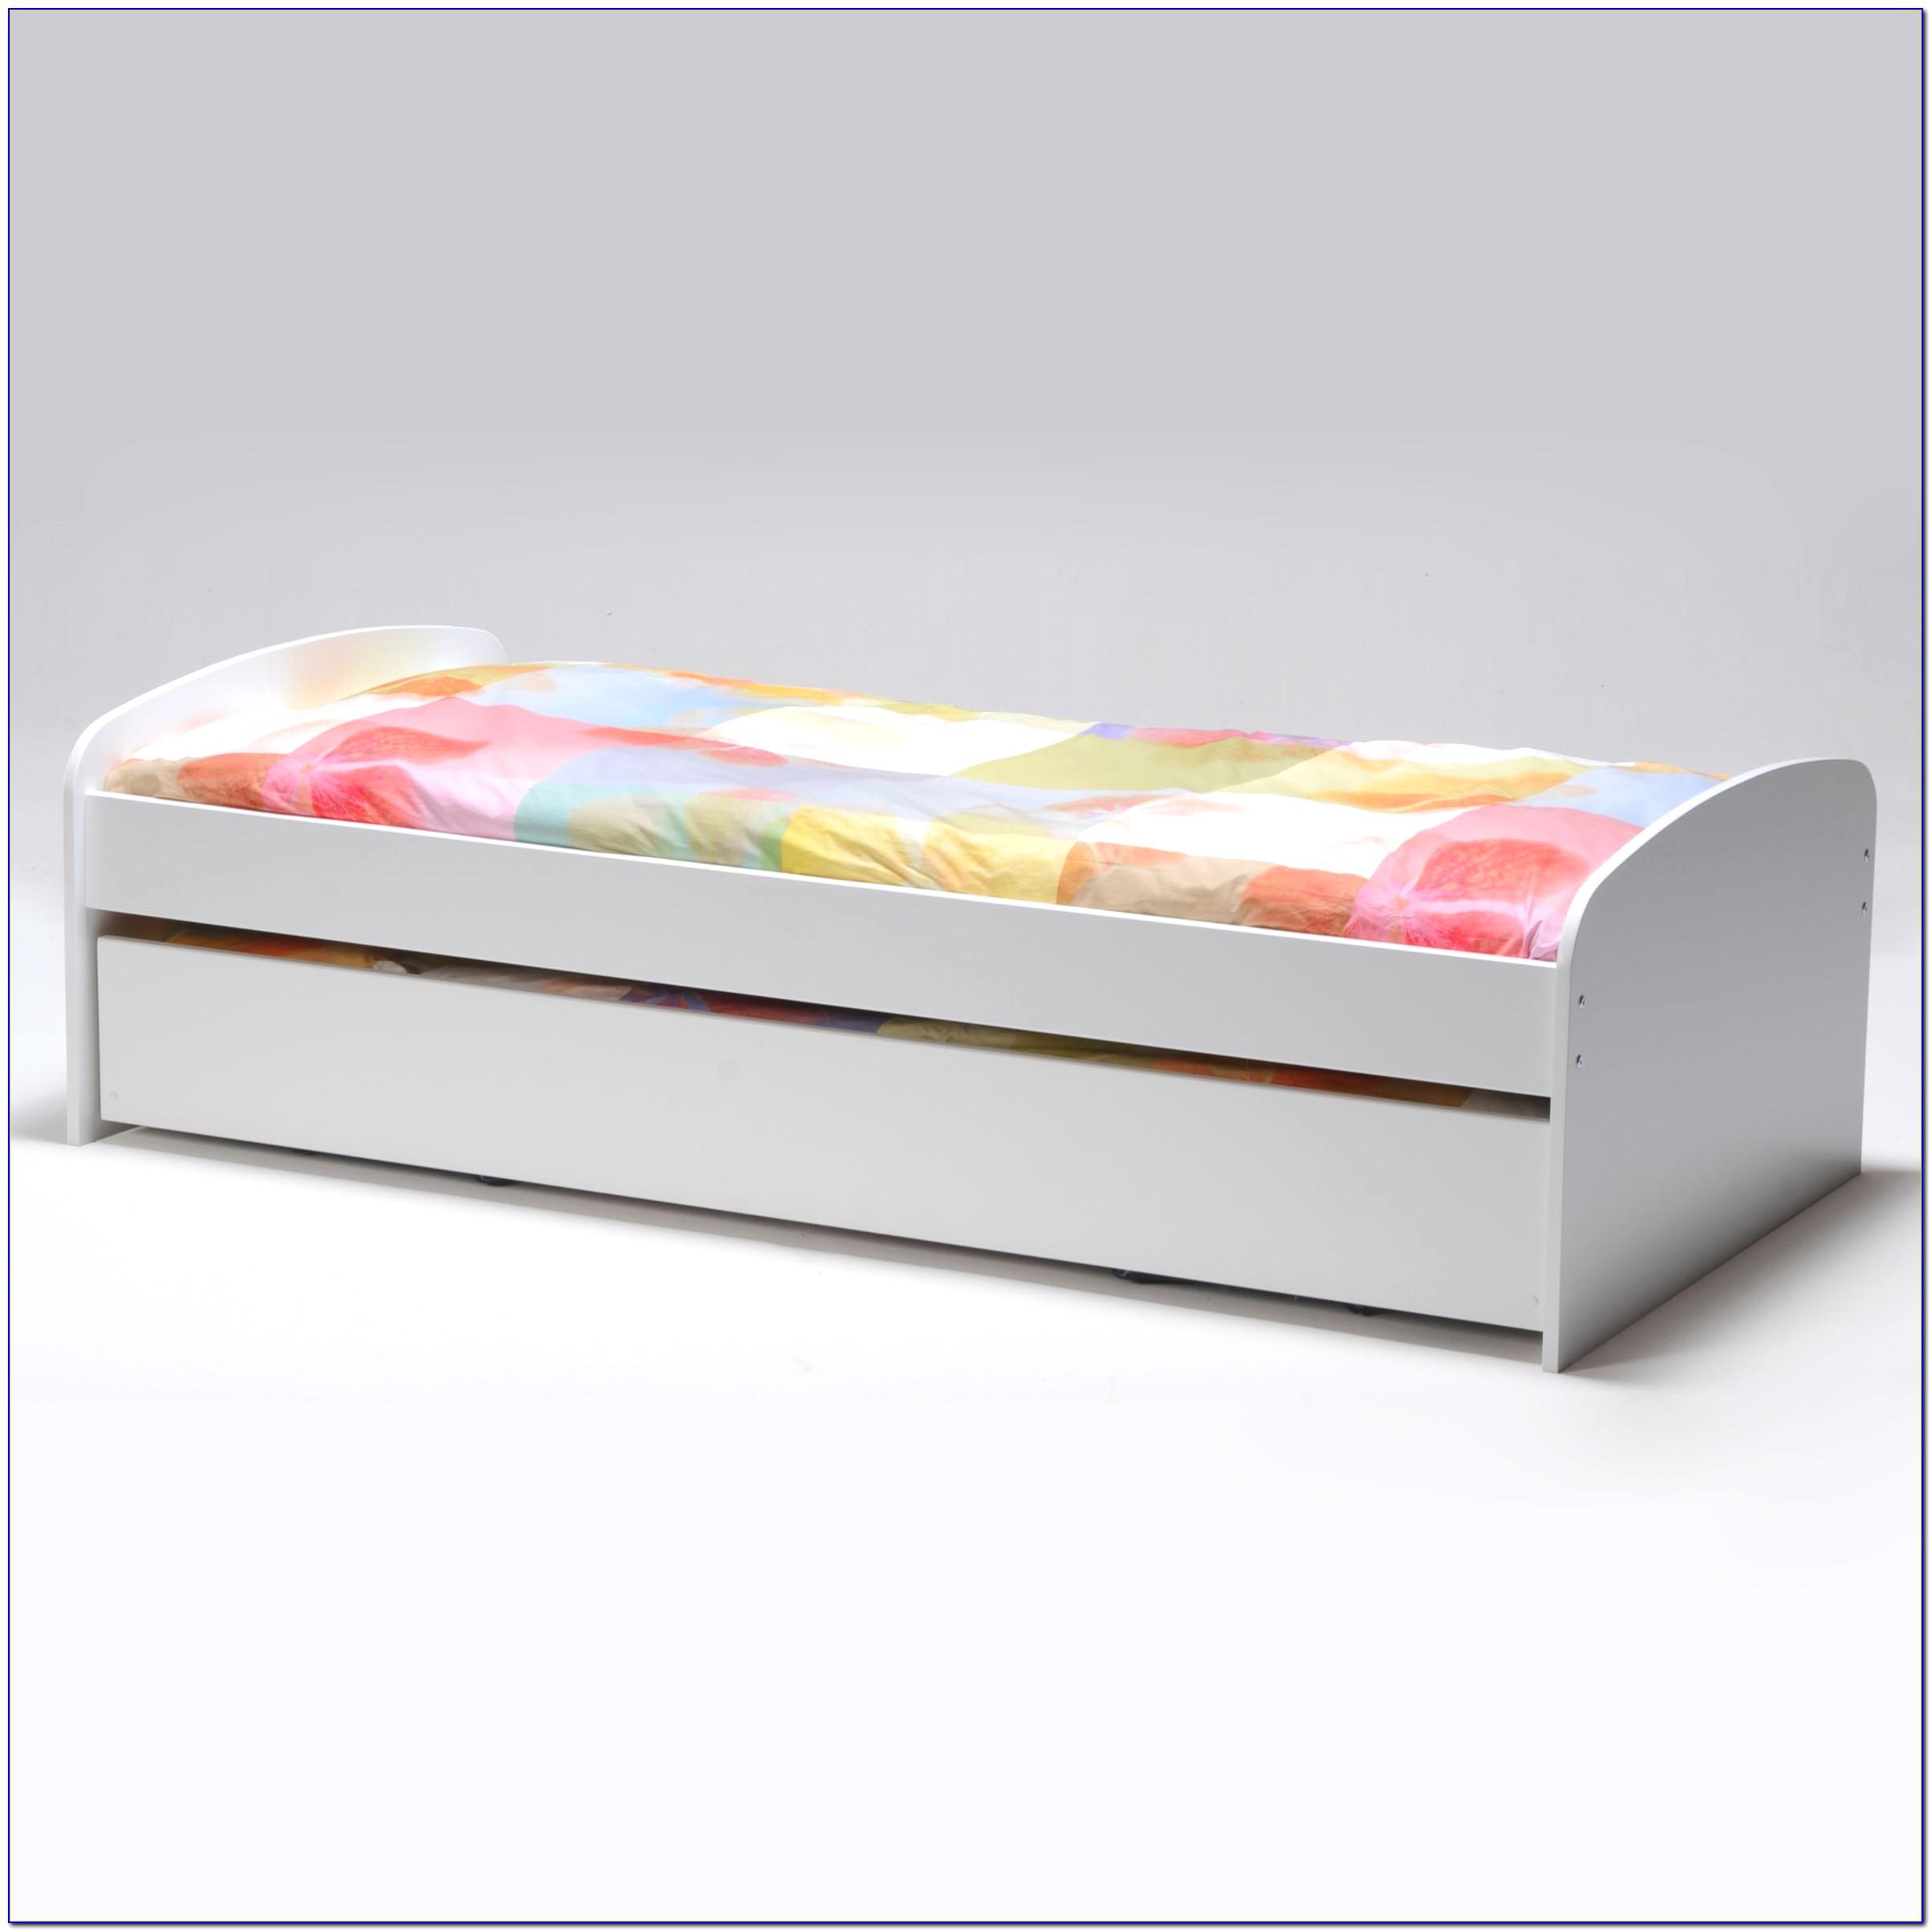 Canapé Lit Gigogne Ikea Impressionnant Stock Lit Gigogne Alina Amazing Lit Gigogne Design Lit Gigogne Design